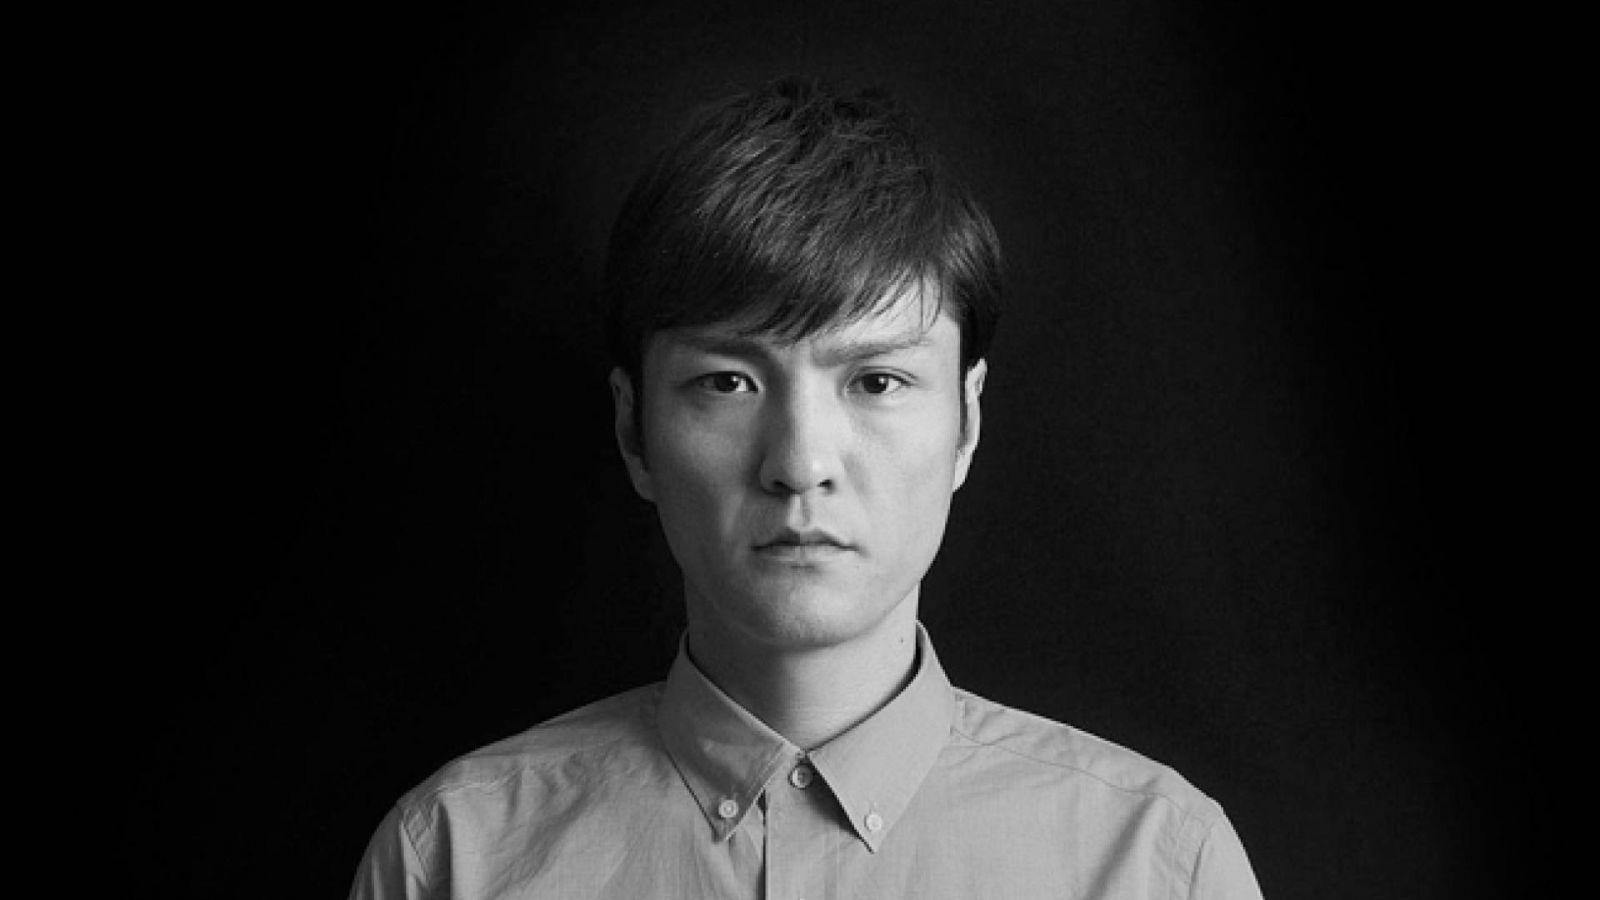 Moriyama Naotaro © Moriyama Naotaro / Universal Music